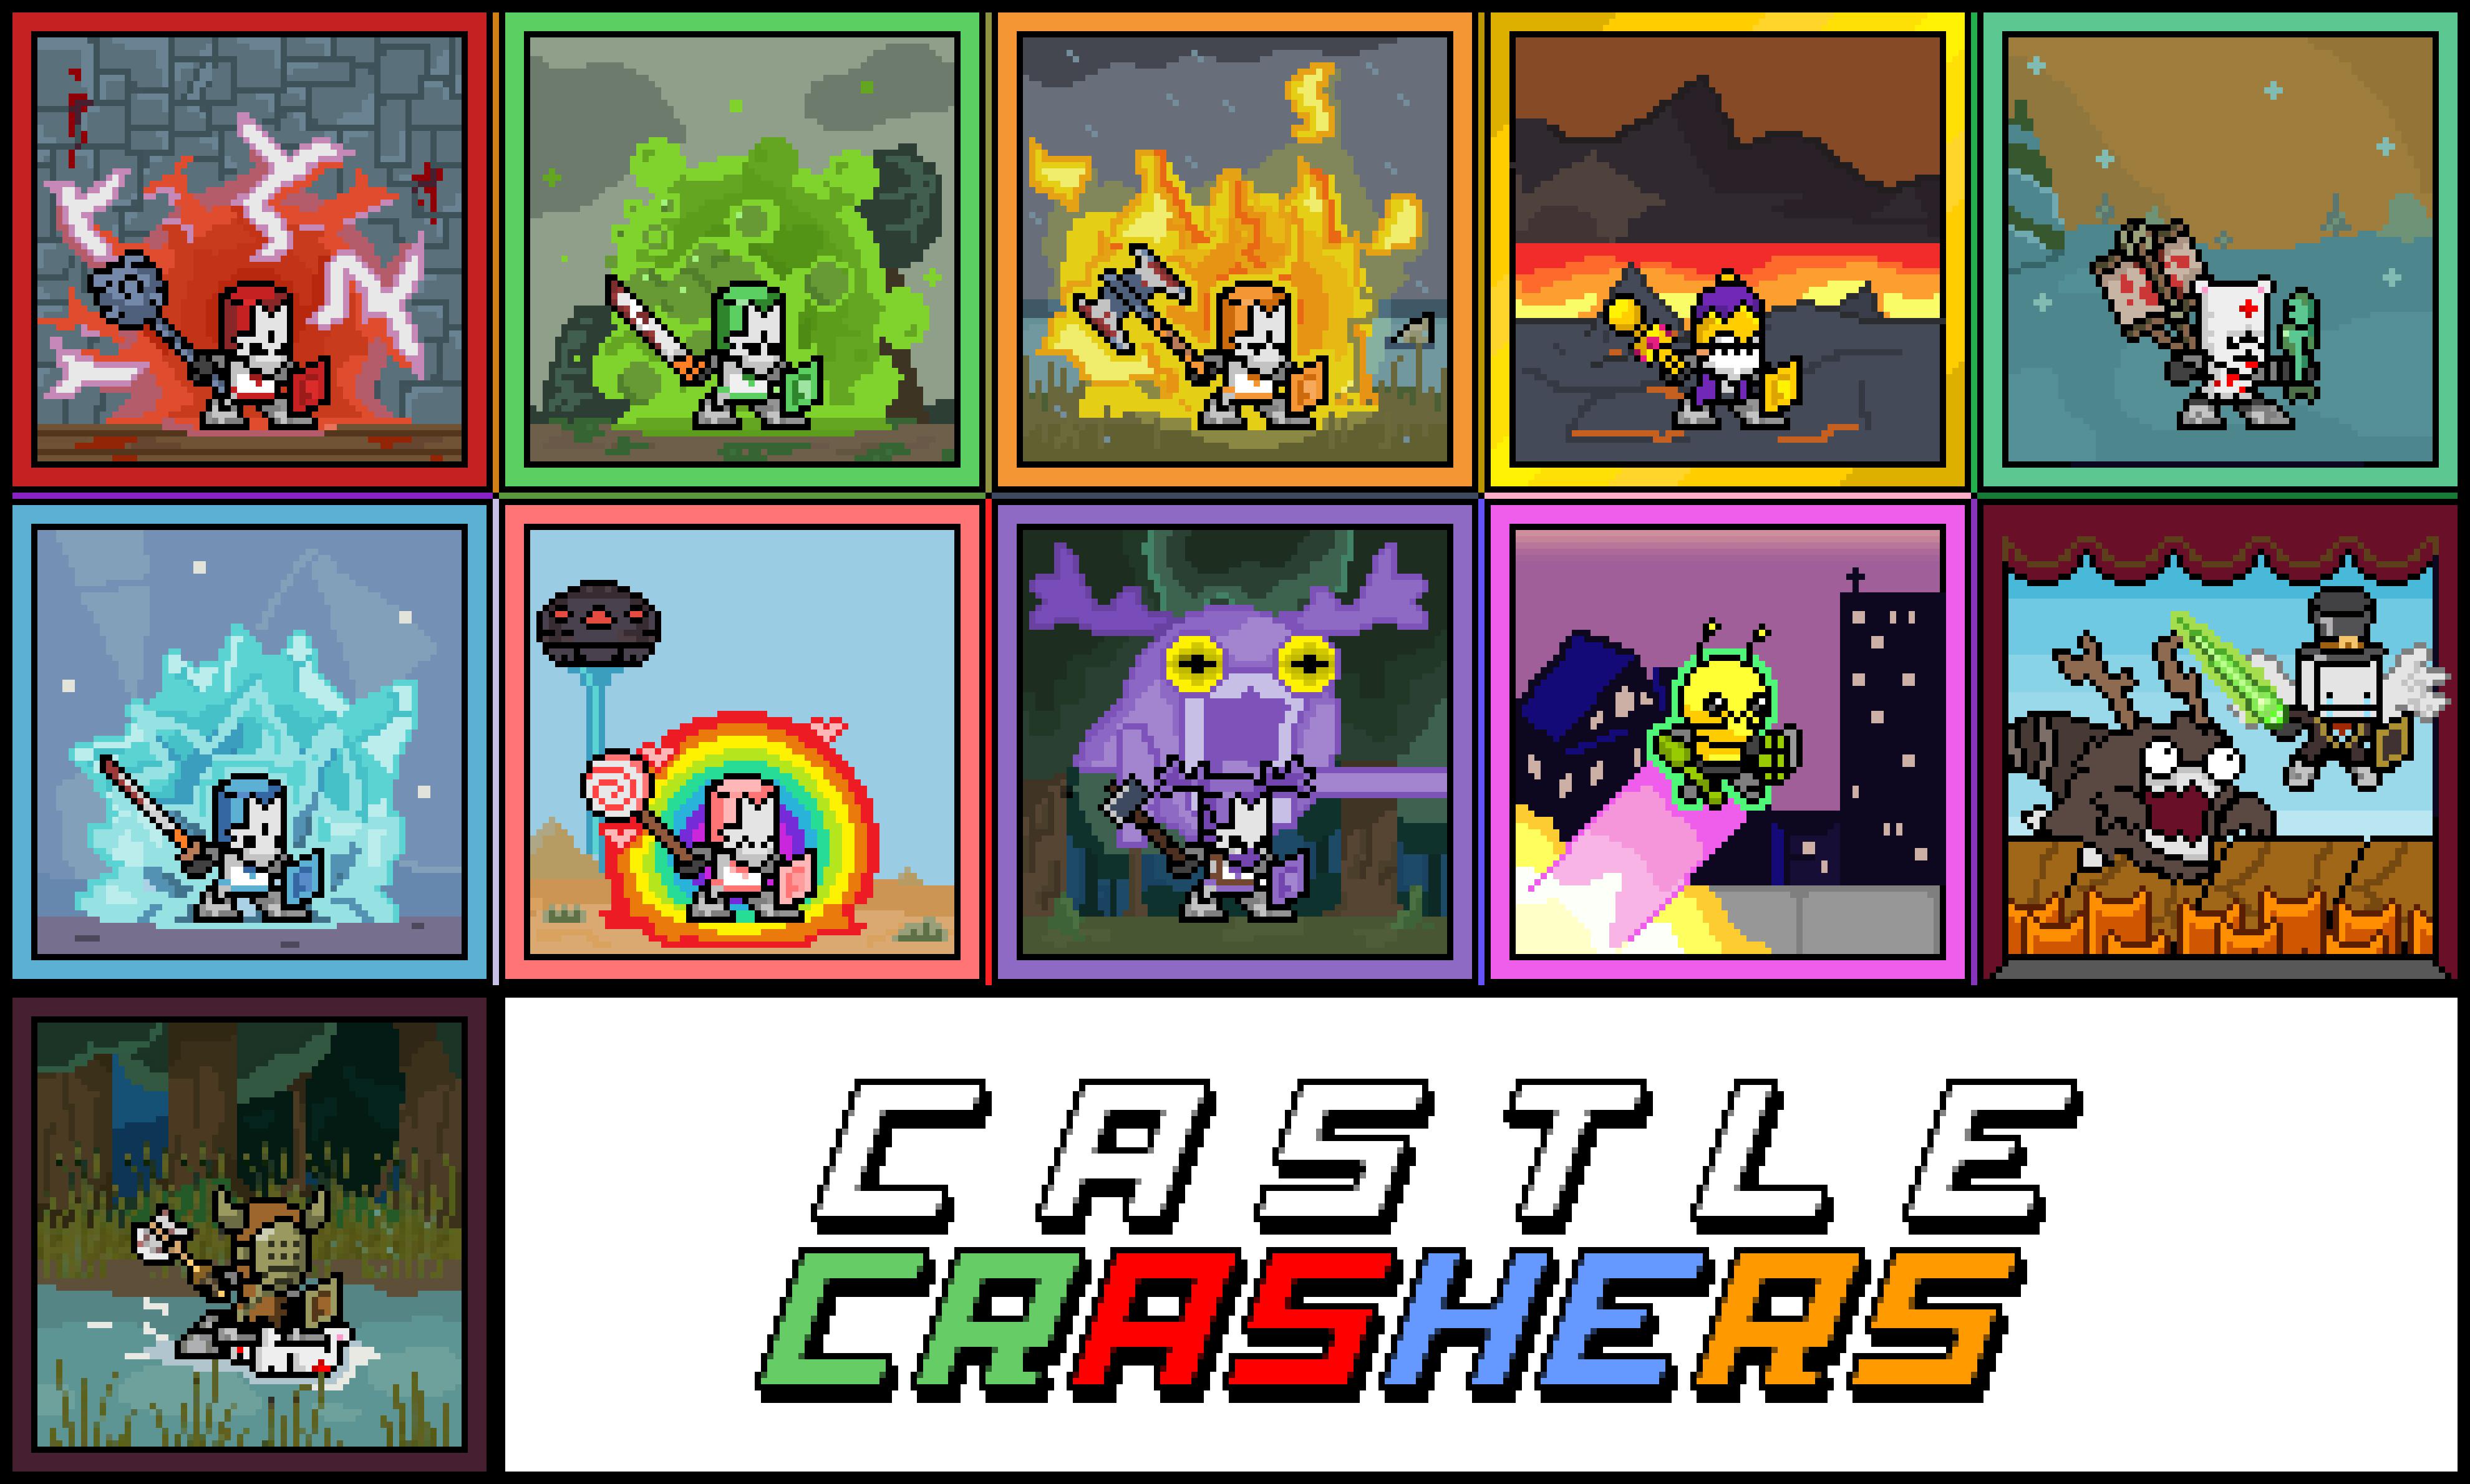 Castle Crashers Sprites